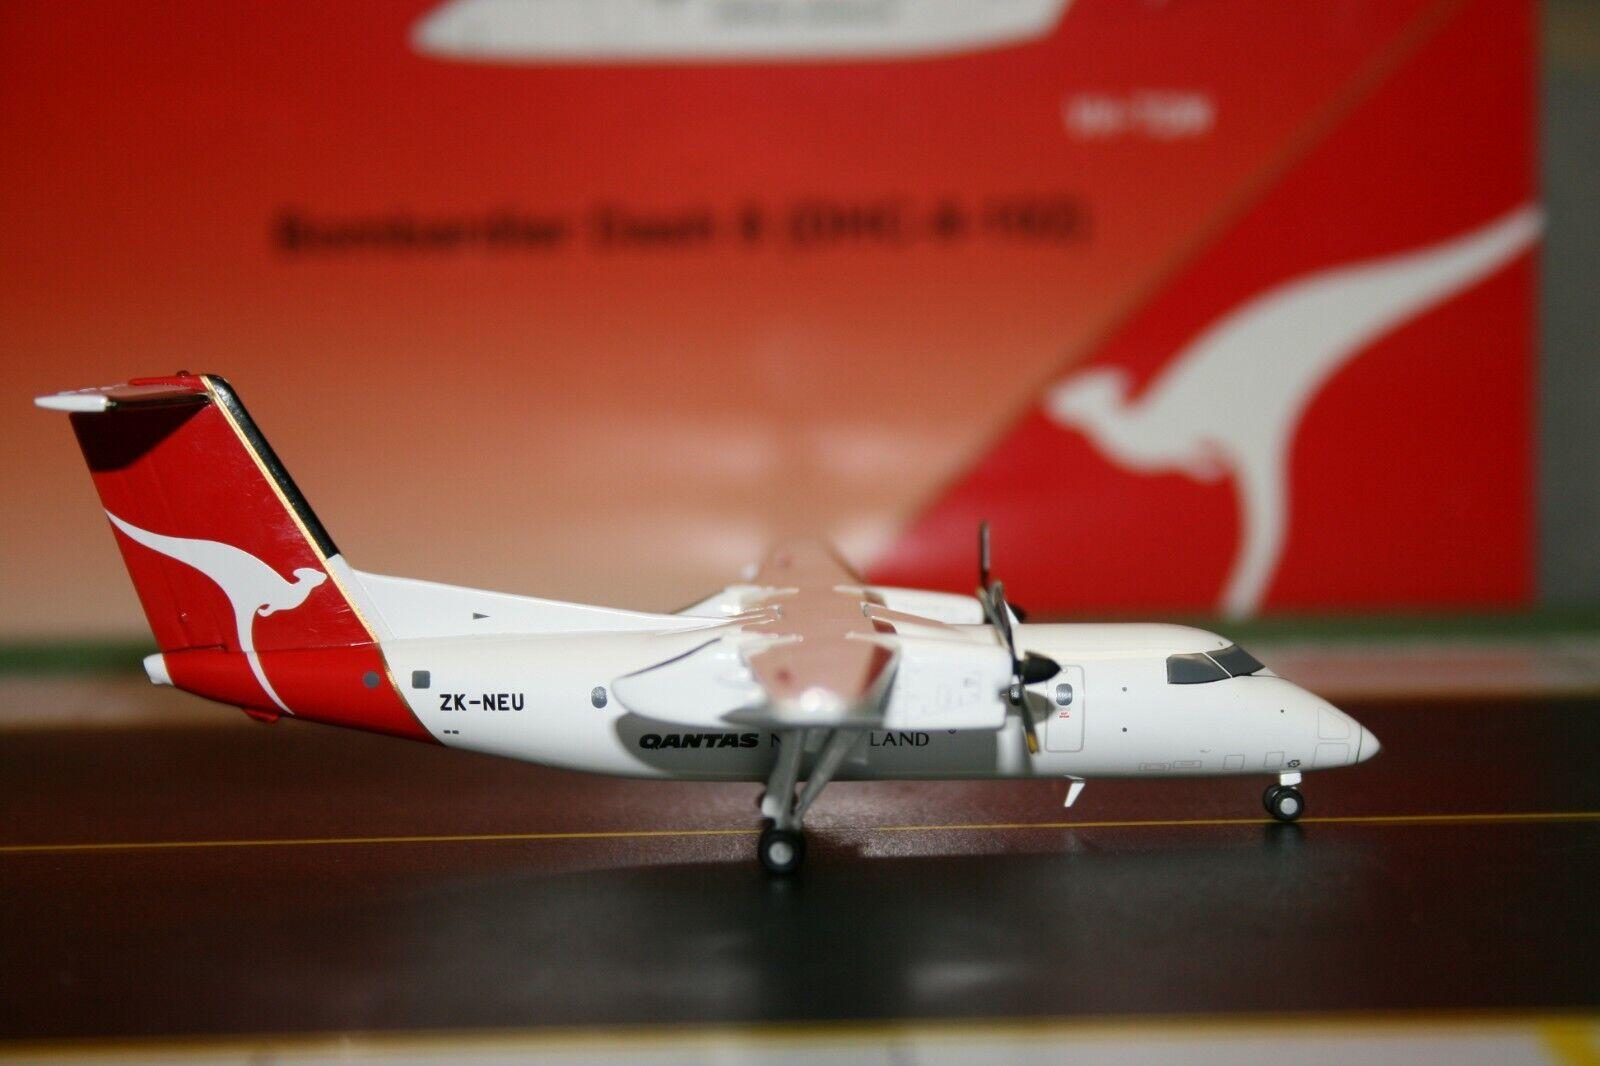 punto de venta Jc Wings 1 200 Qantas New Zealand Dash Dash Dash - 8-100 Zk-Neu (XX2585) modelo de avión  tienda en linea